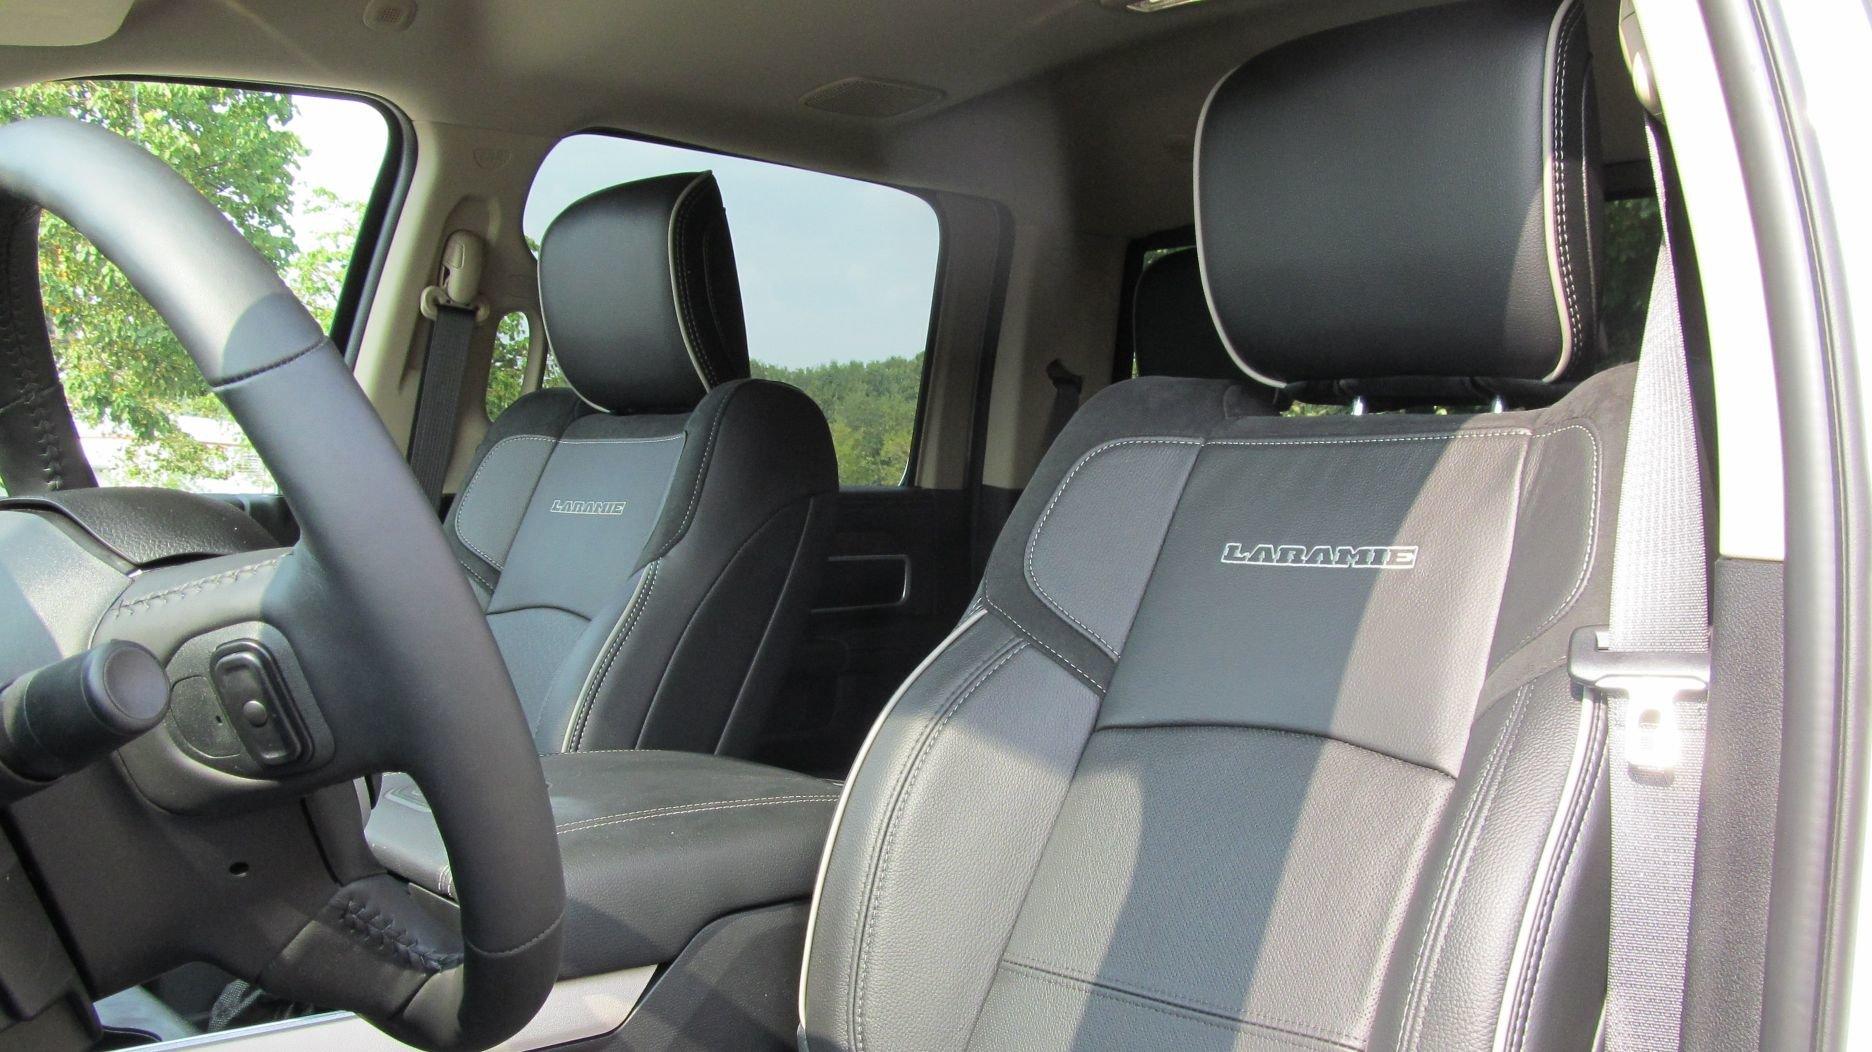 2019 Dodge RAM 2500 HD 6.4L V8 Laramie Crew Cab 4x4 For Sale (picture 3 of 6)